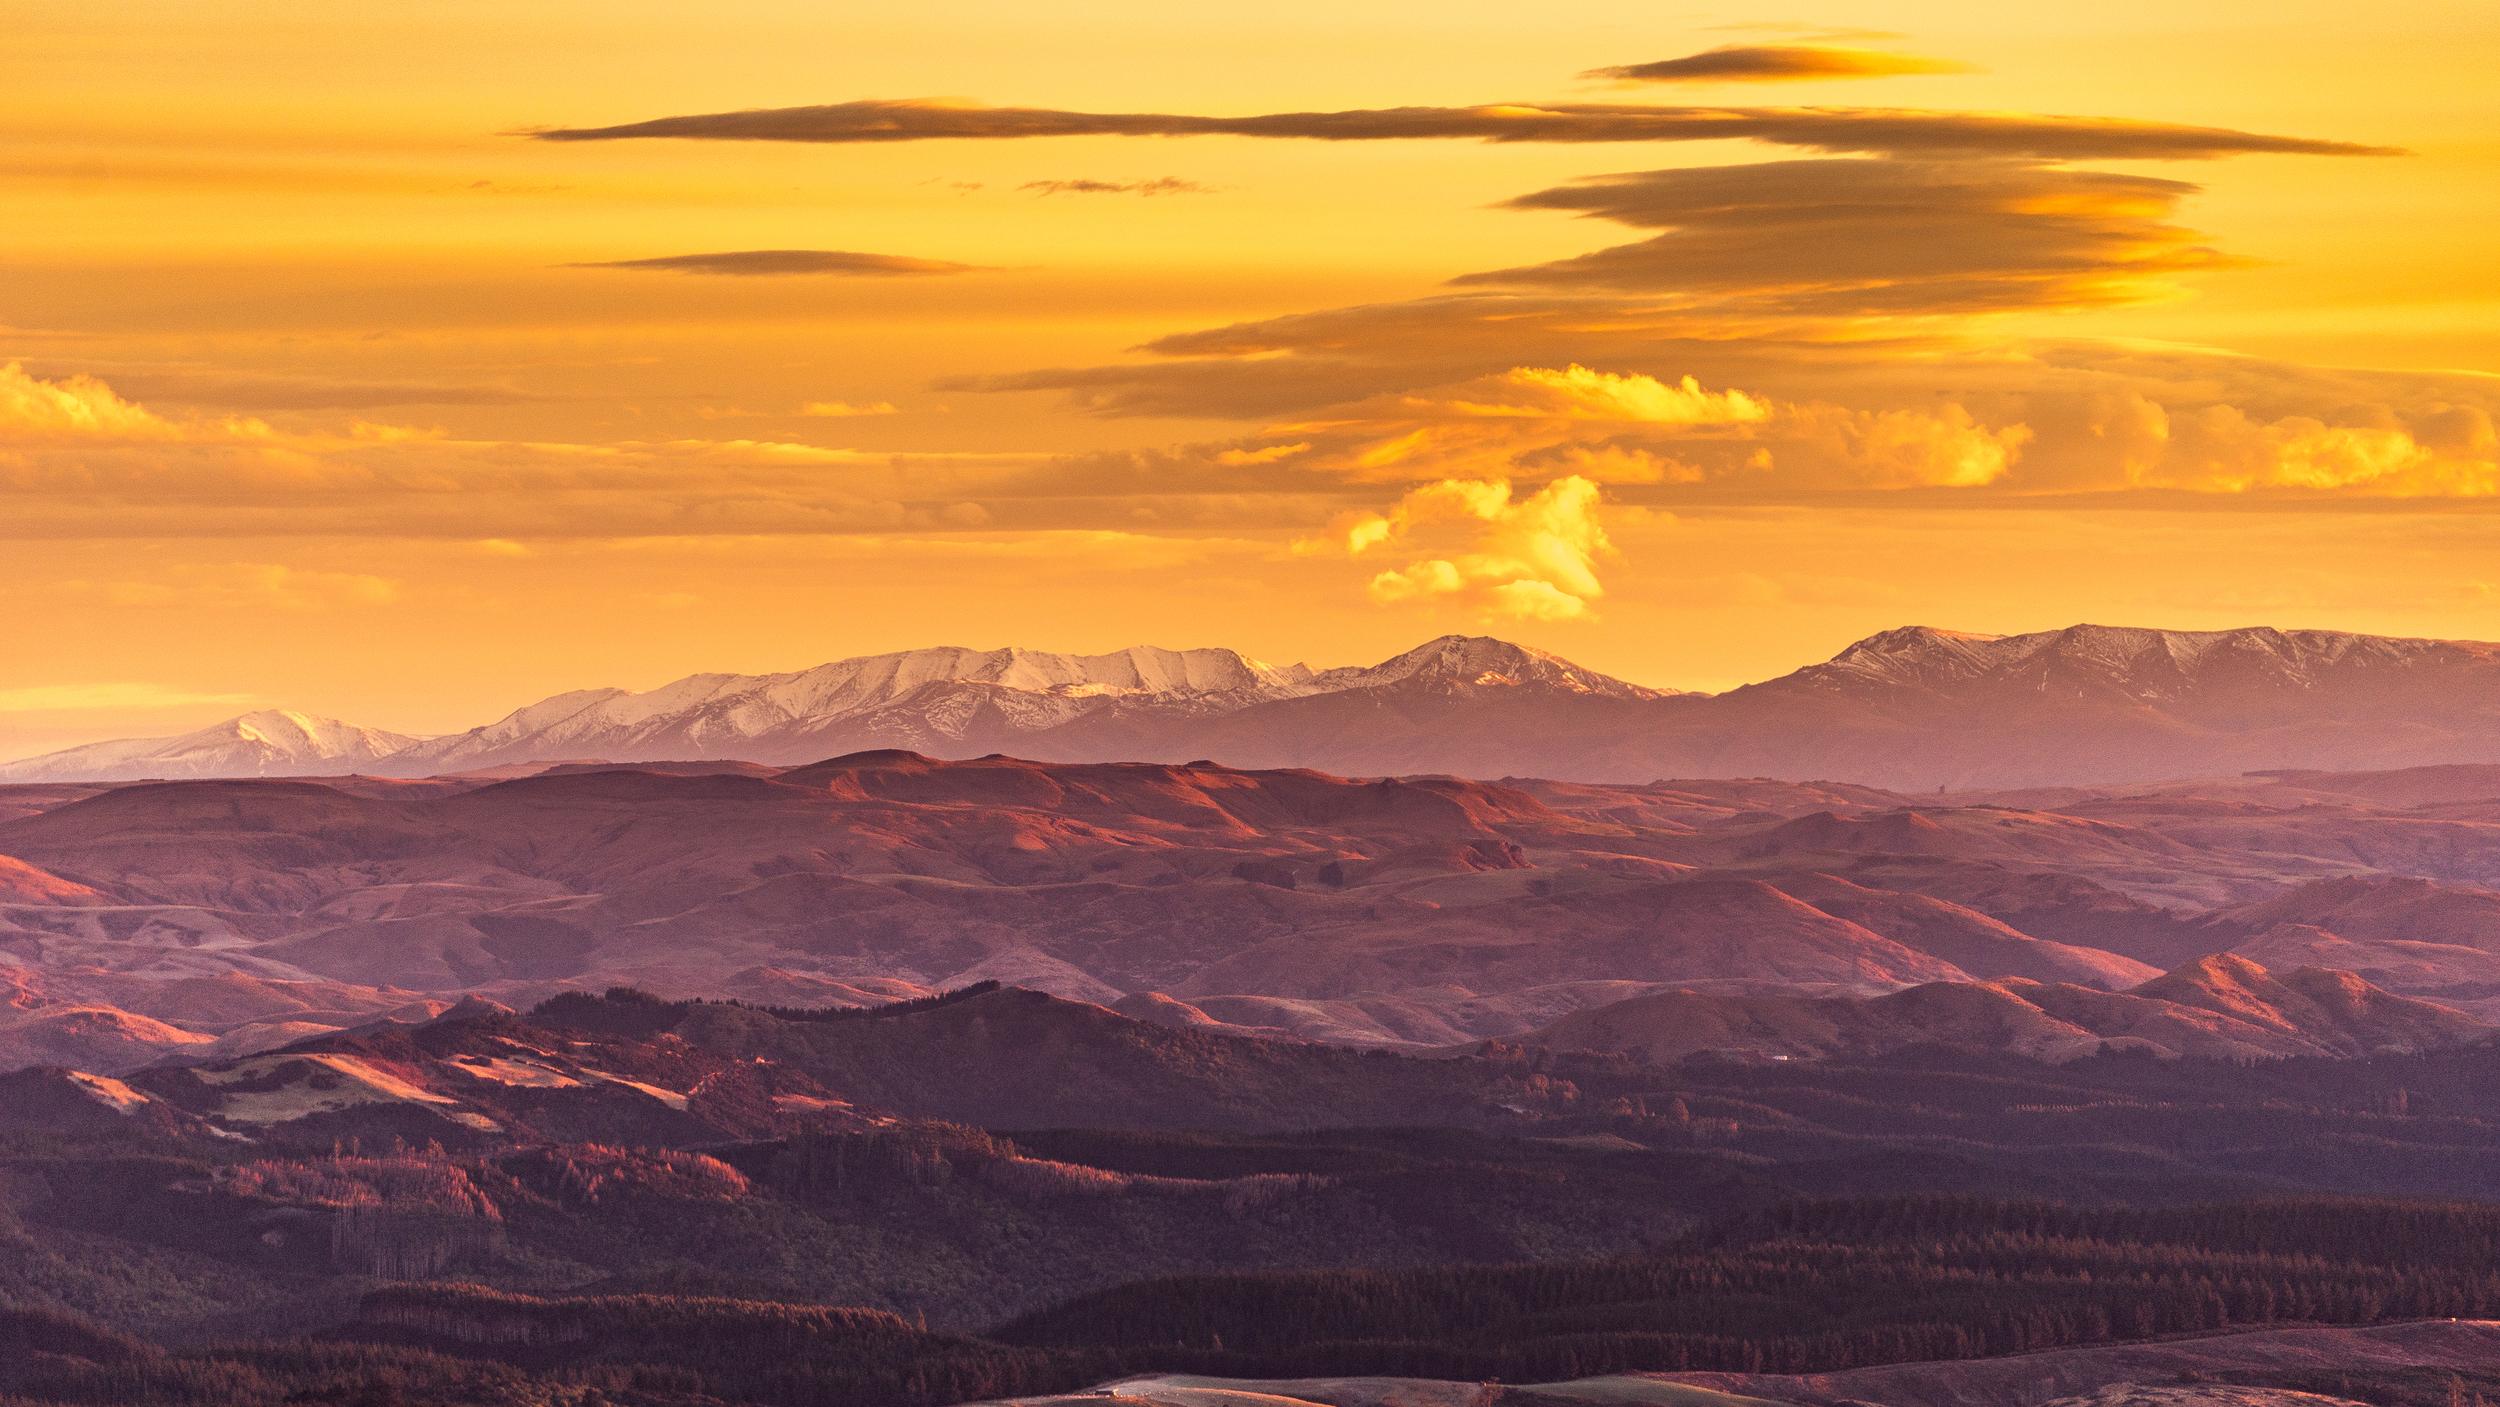 sunrise-mountainglow-June2016-fbook (1 of 1).jpg